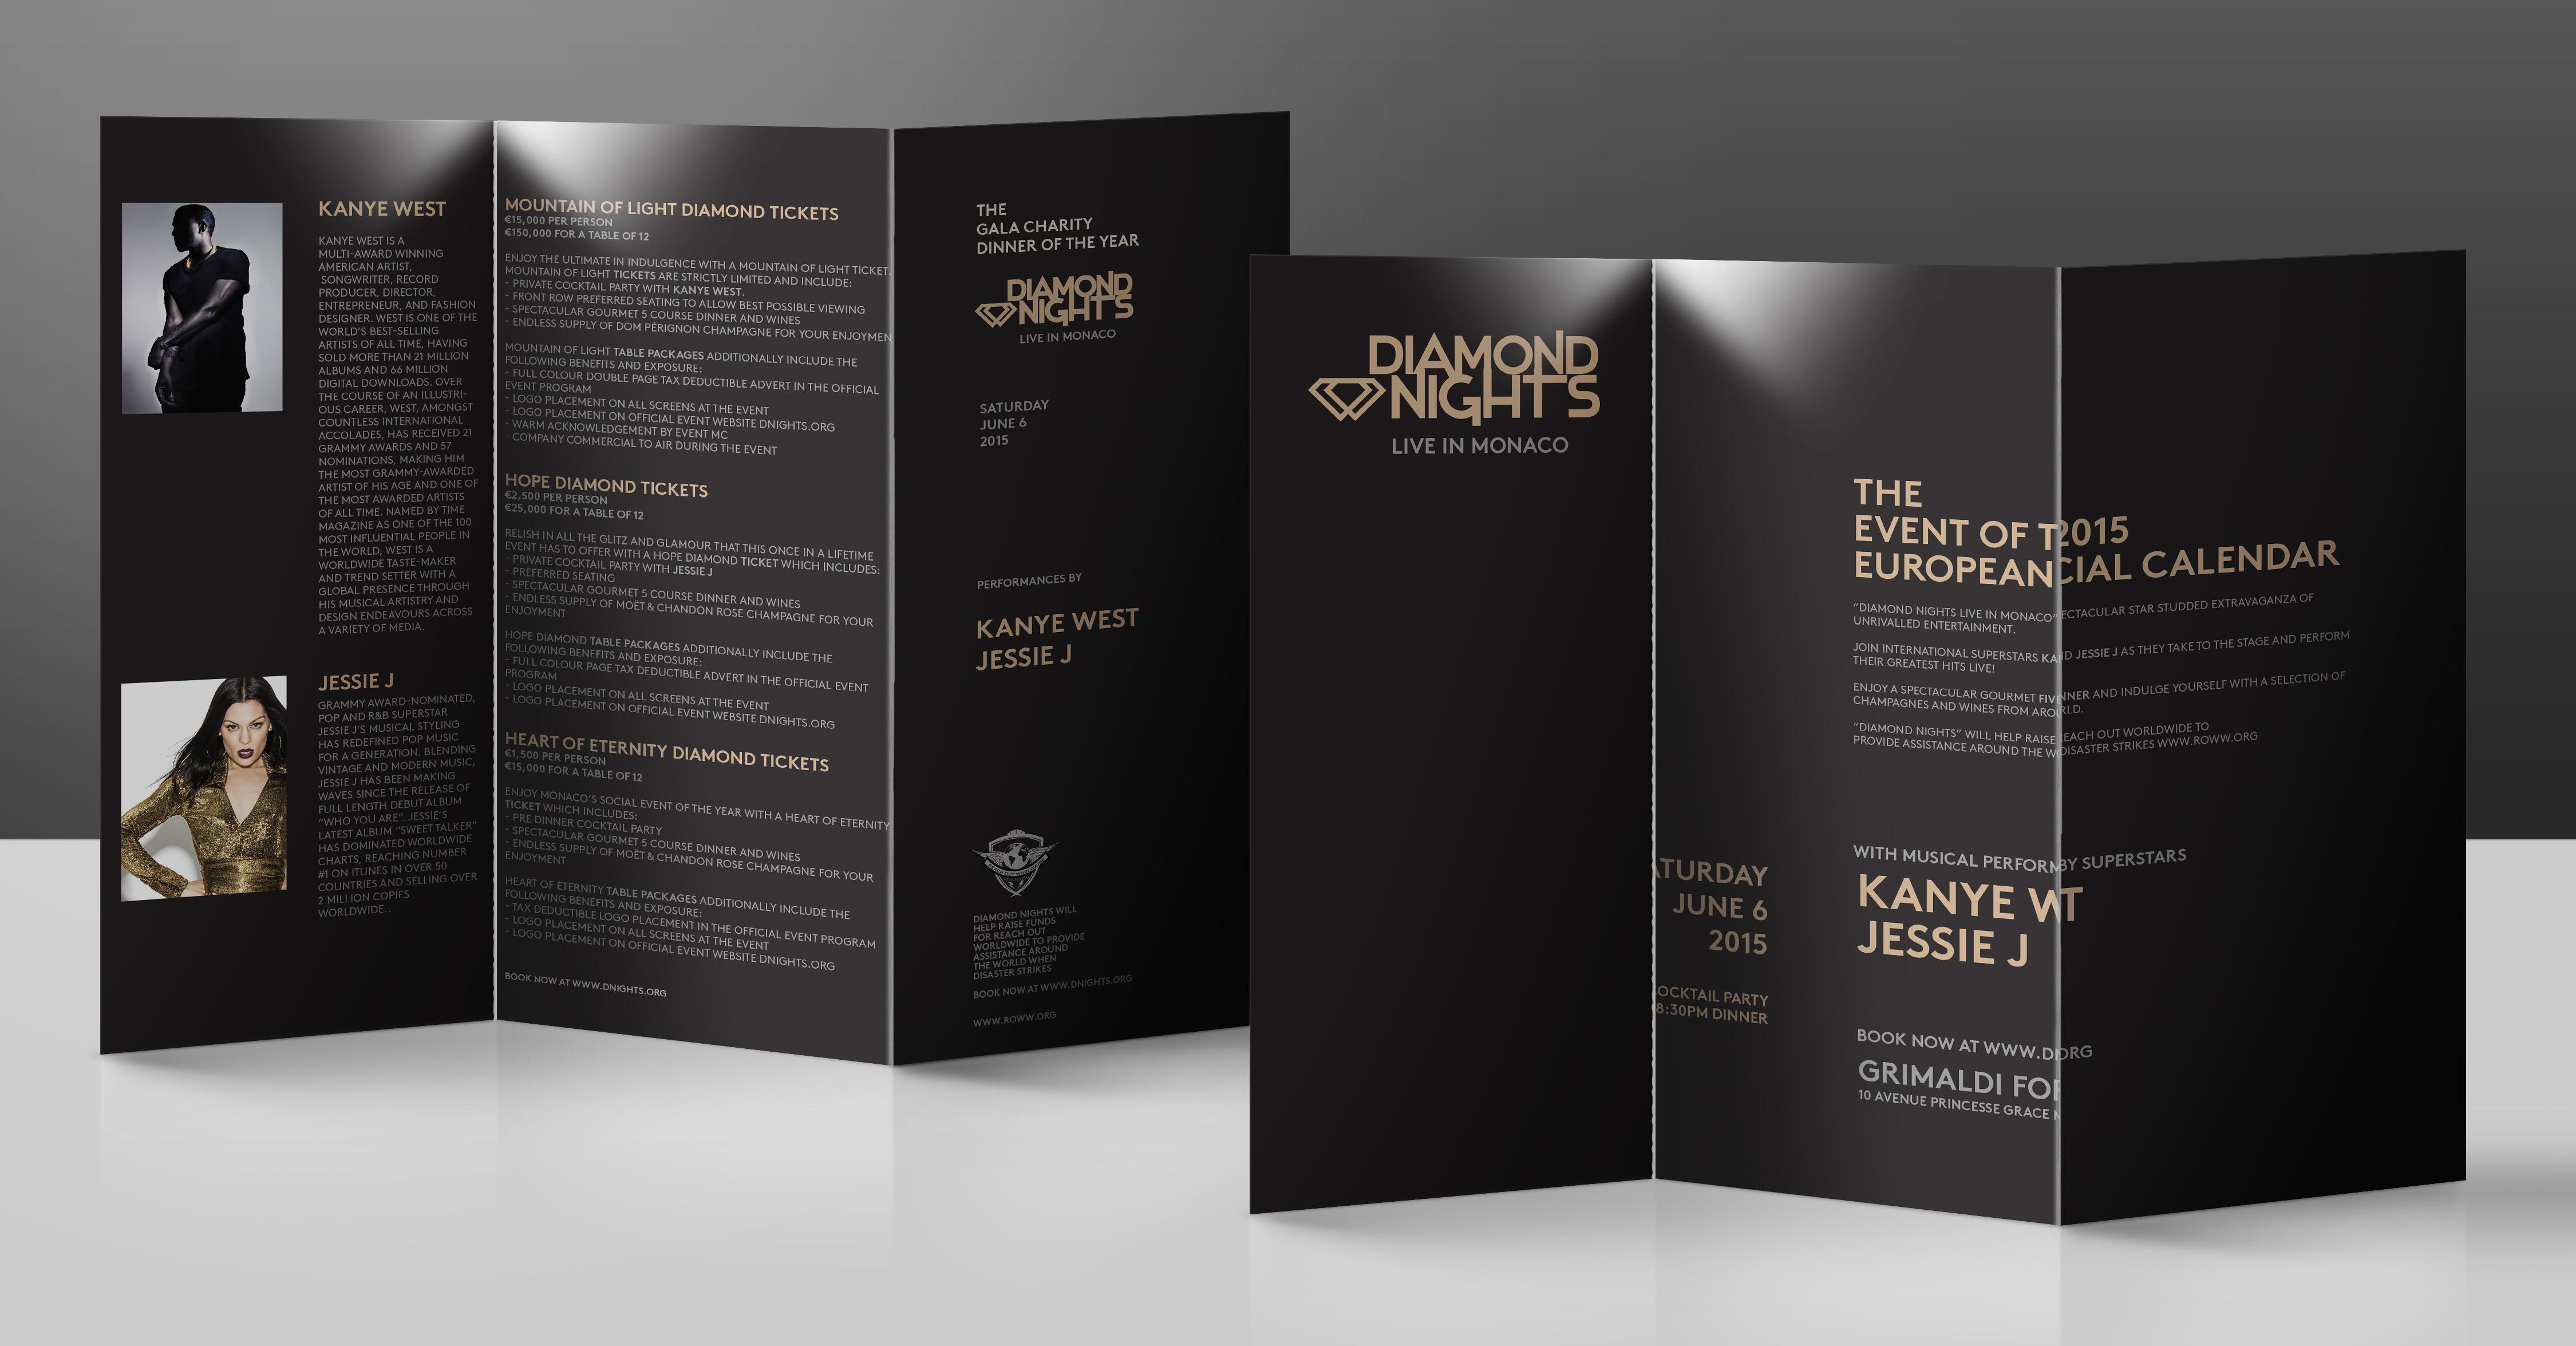 kanye_west_invite